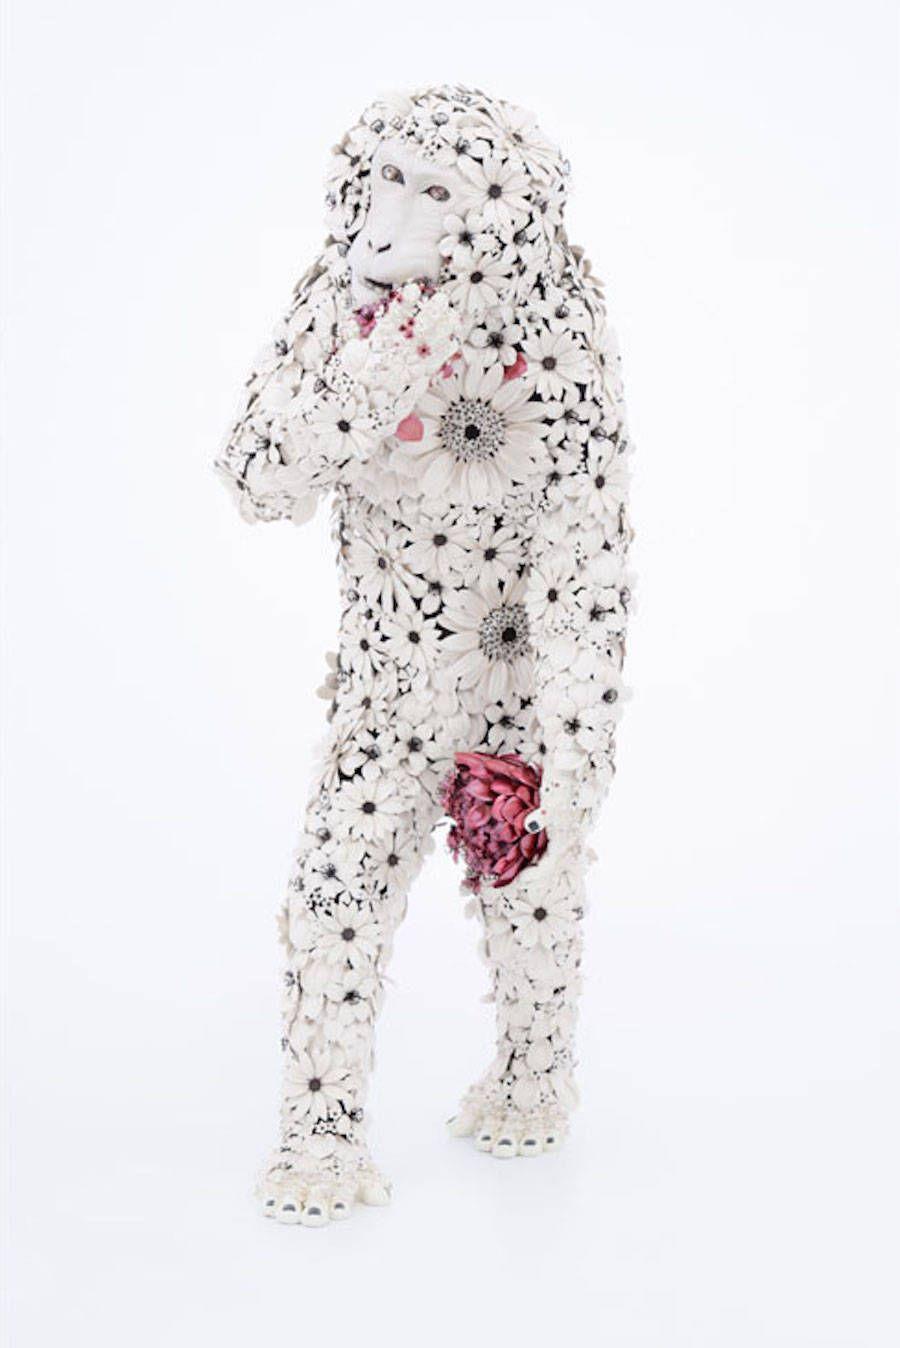 Animals Metal Sculptures by Taiichiro Yoshida – Fubiz Media